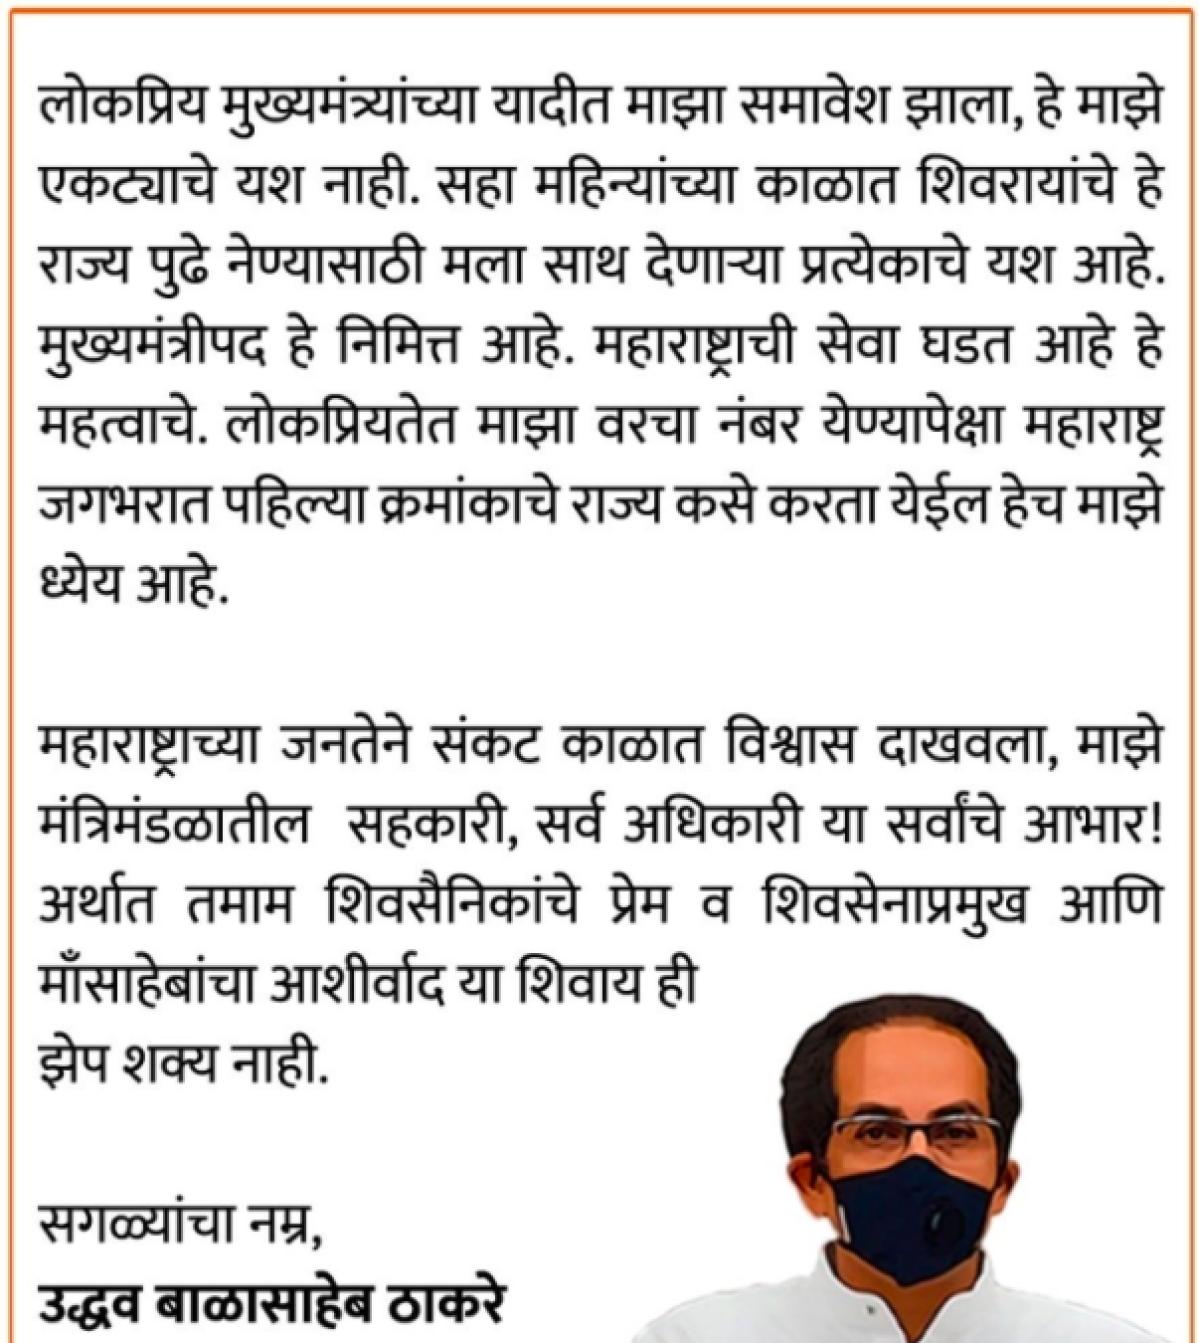 Maharashtra CM Uddhav Thackeray ranked among top five most popular CMs in India